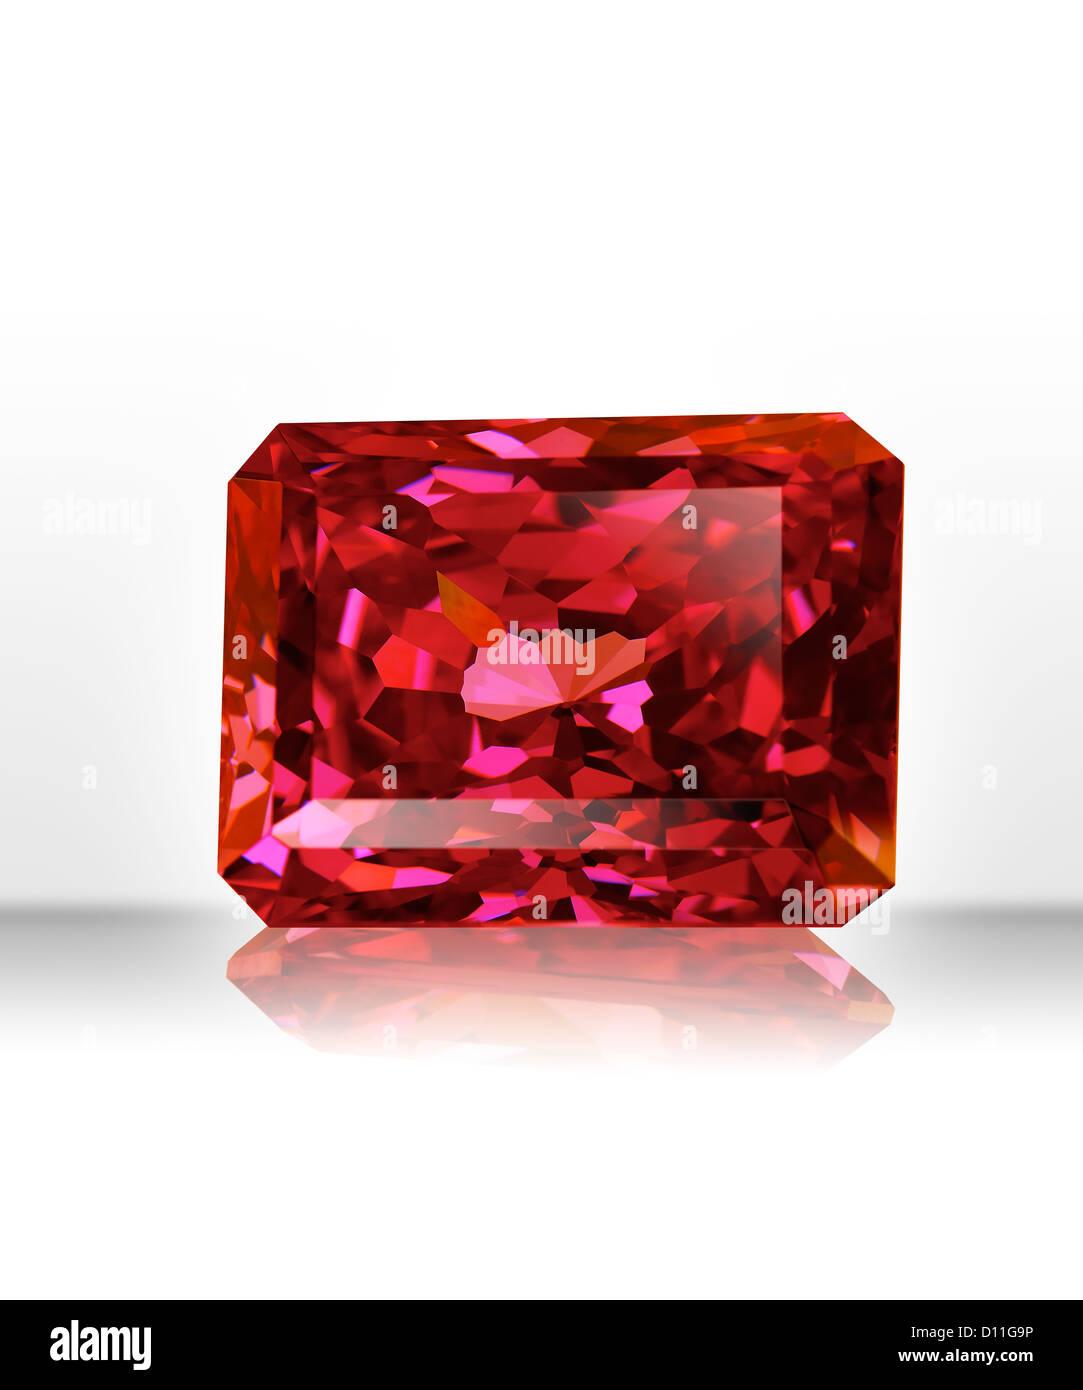 Red rectangular gemstone - Stock Image